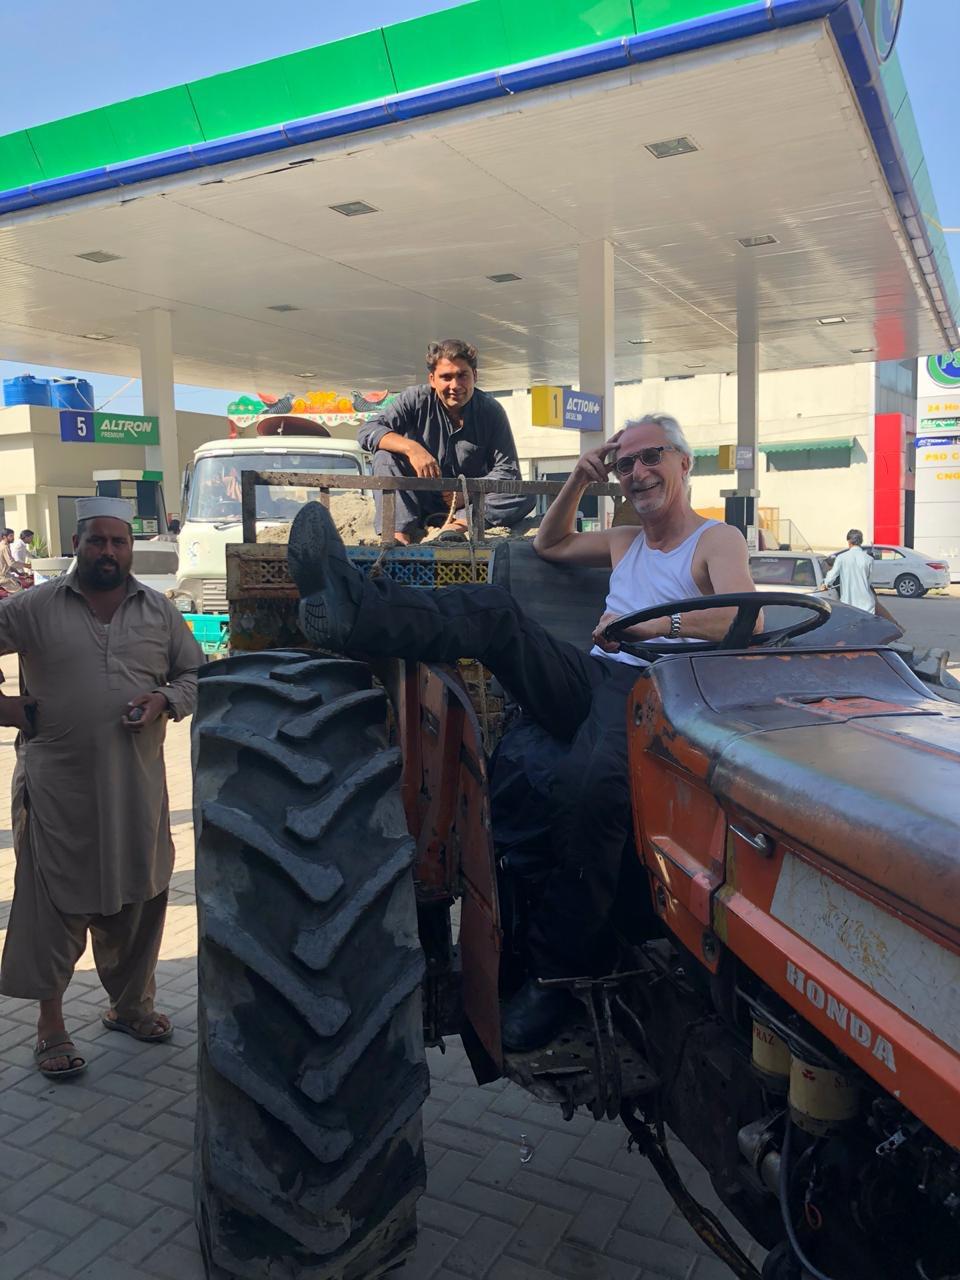 Sandro touche à son rêve secret: devenir fermier au Pakistan  Sandro finally gets to touch his lifelong hidden dream: be a farmer in Pakistan